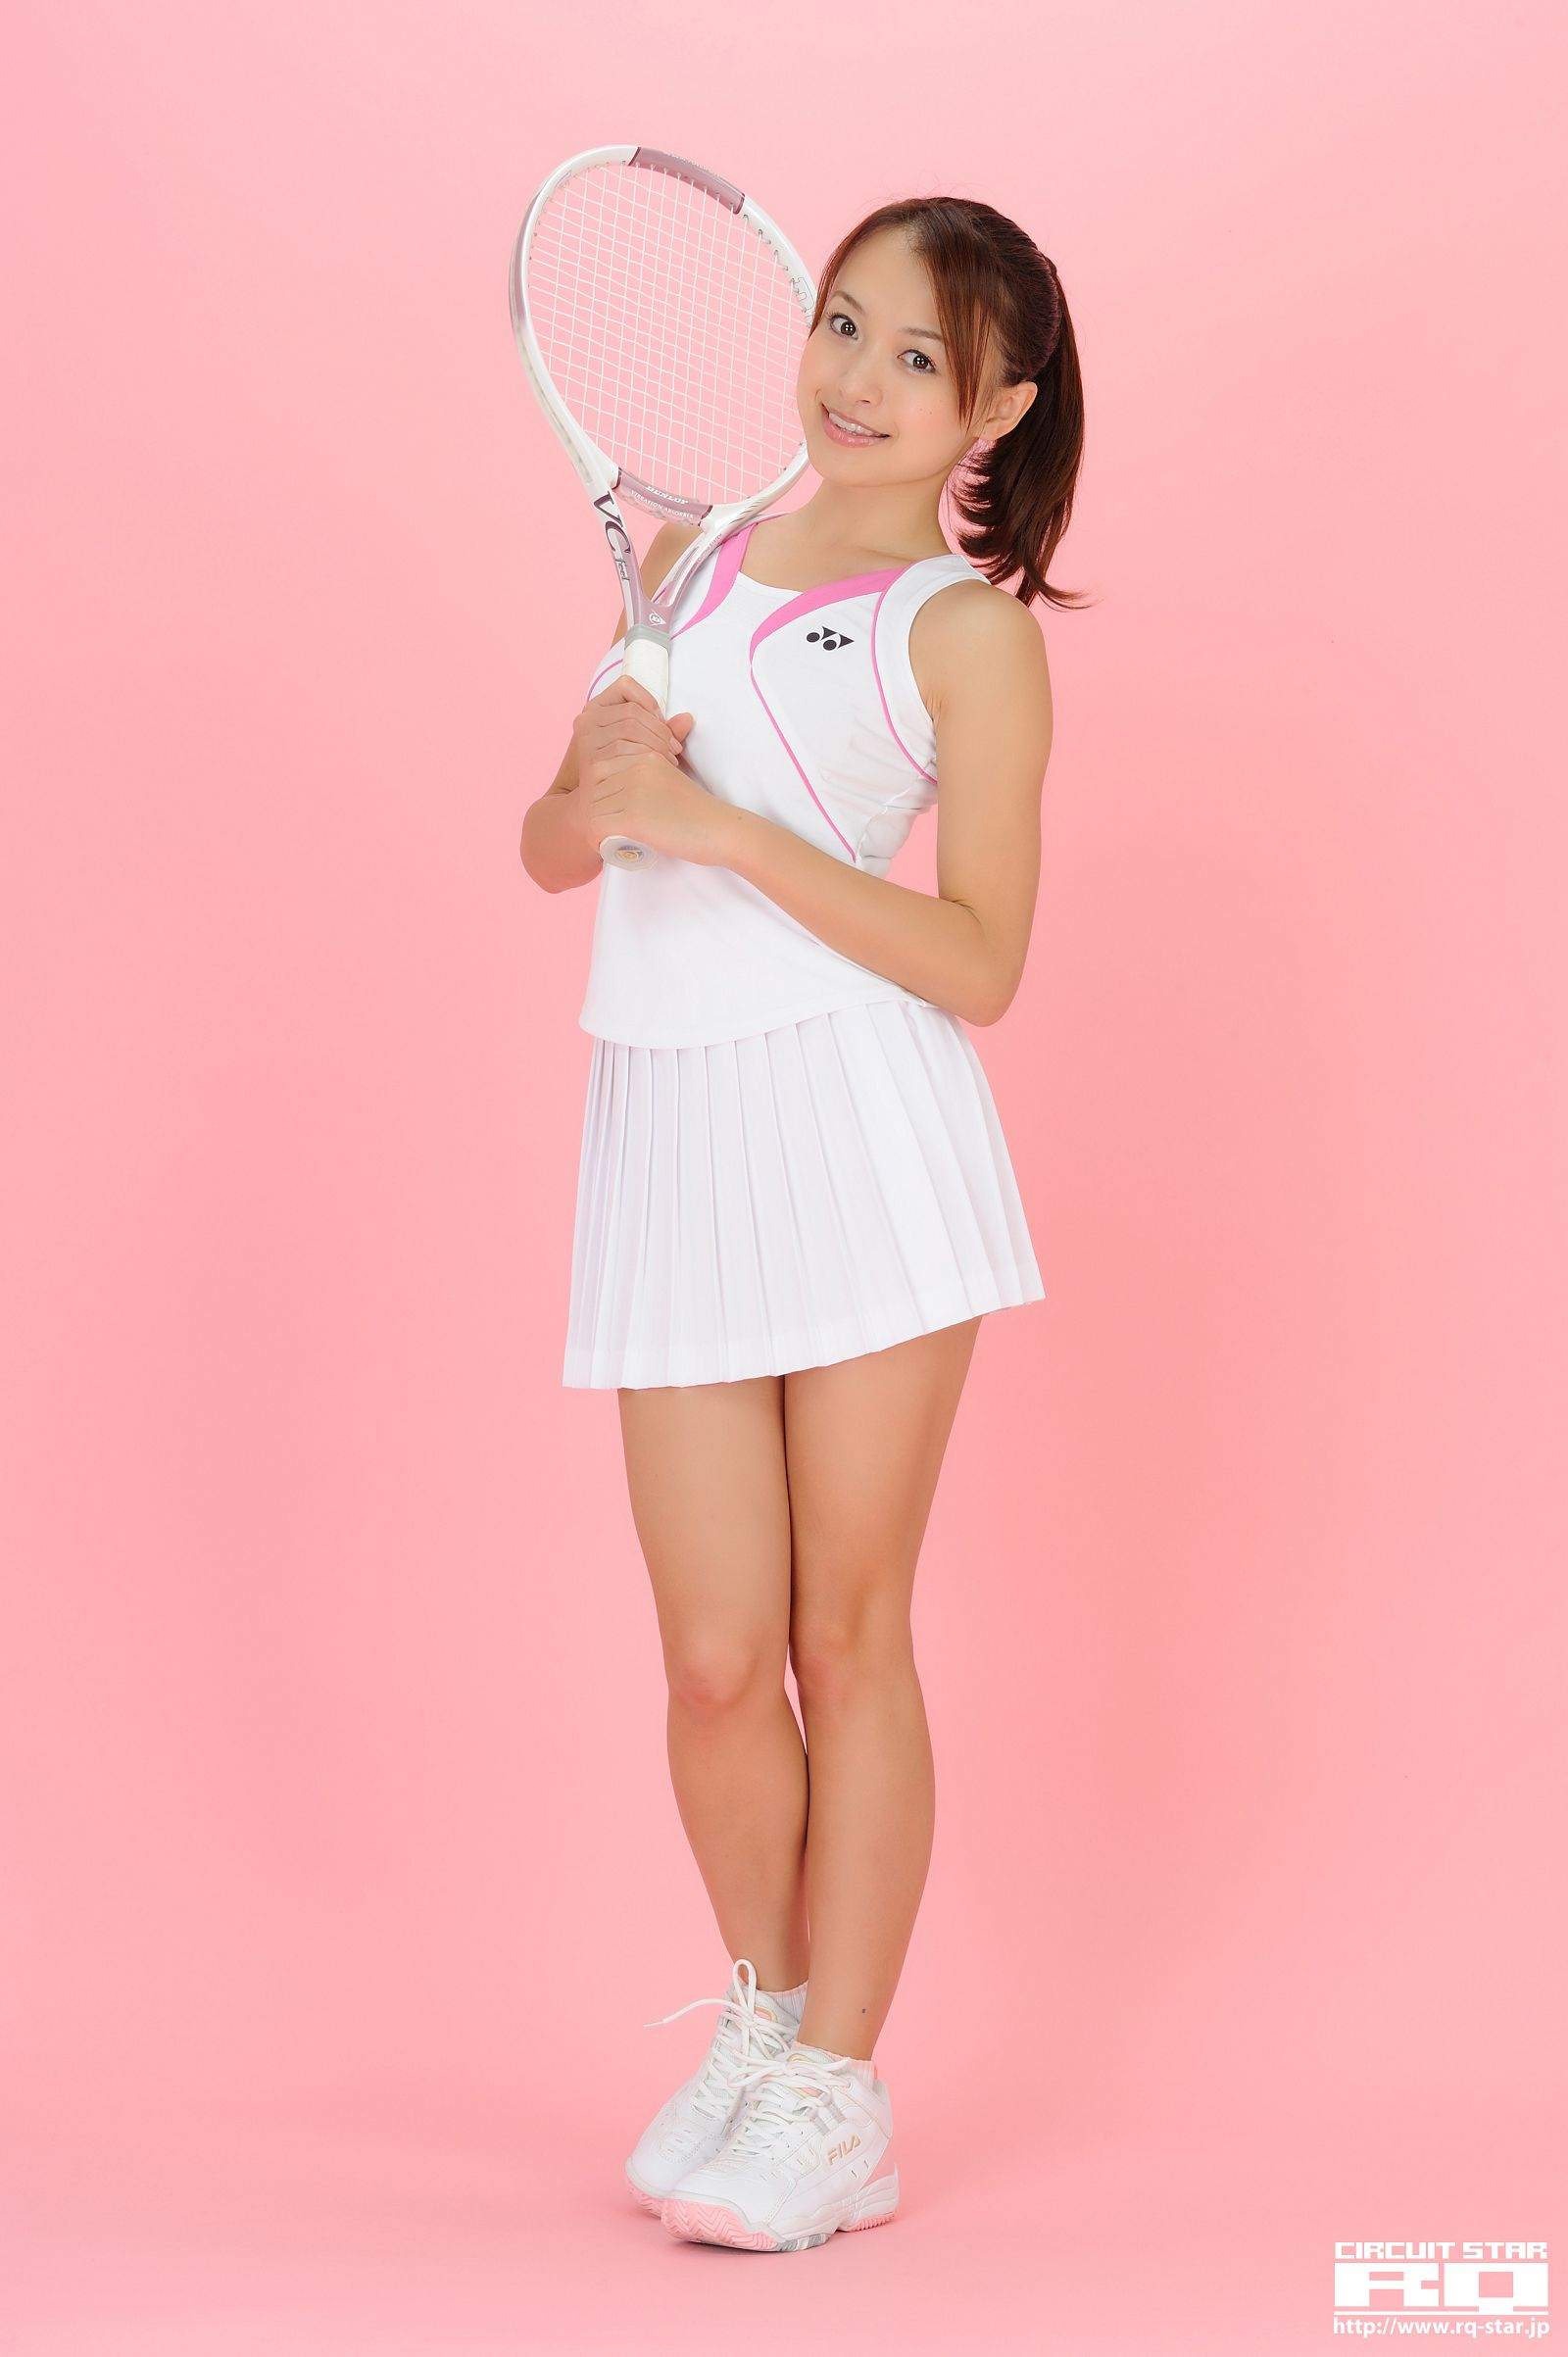 [RQ STAR美女] NO.00434 Rina Itoh 伊東りな Tennis Wear[100P] RQ STAR 第2张